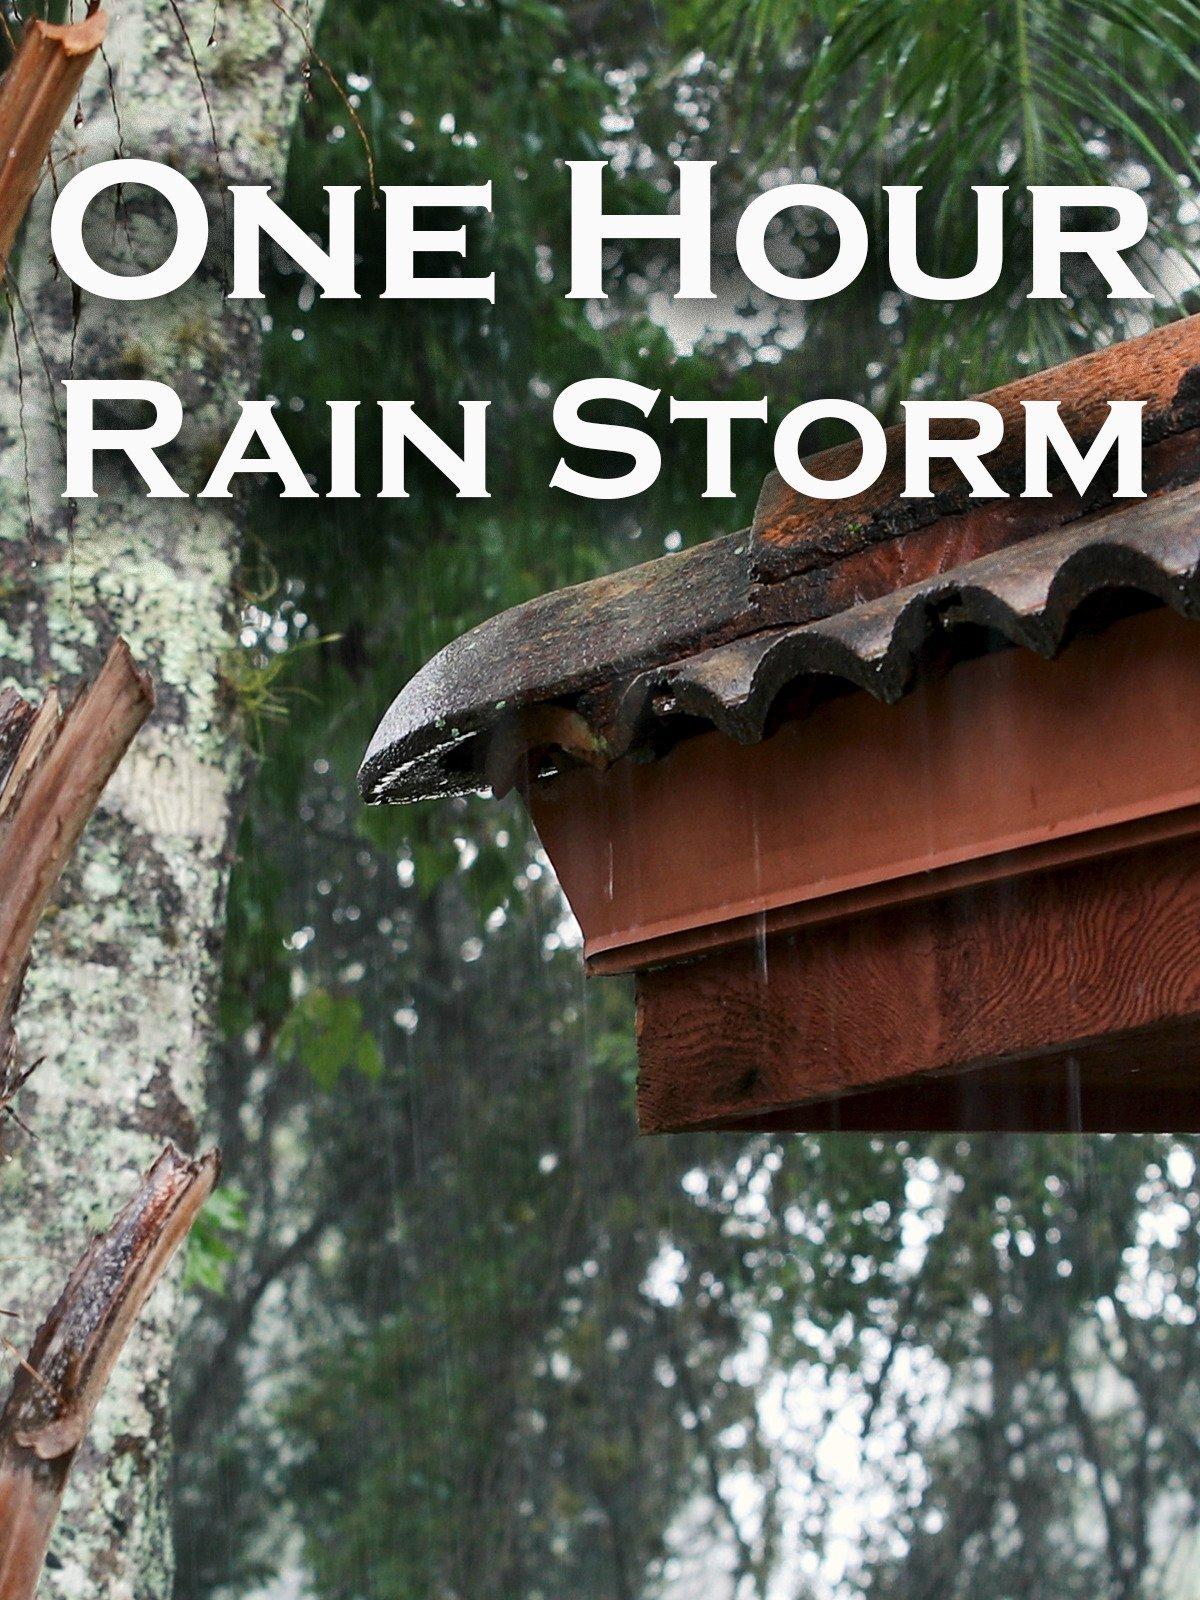 One Hour Rain Storm